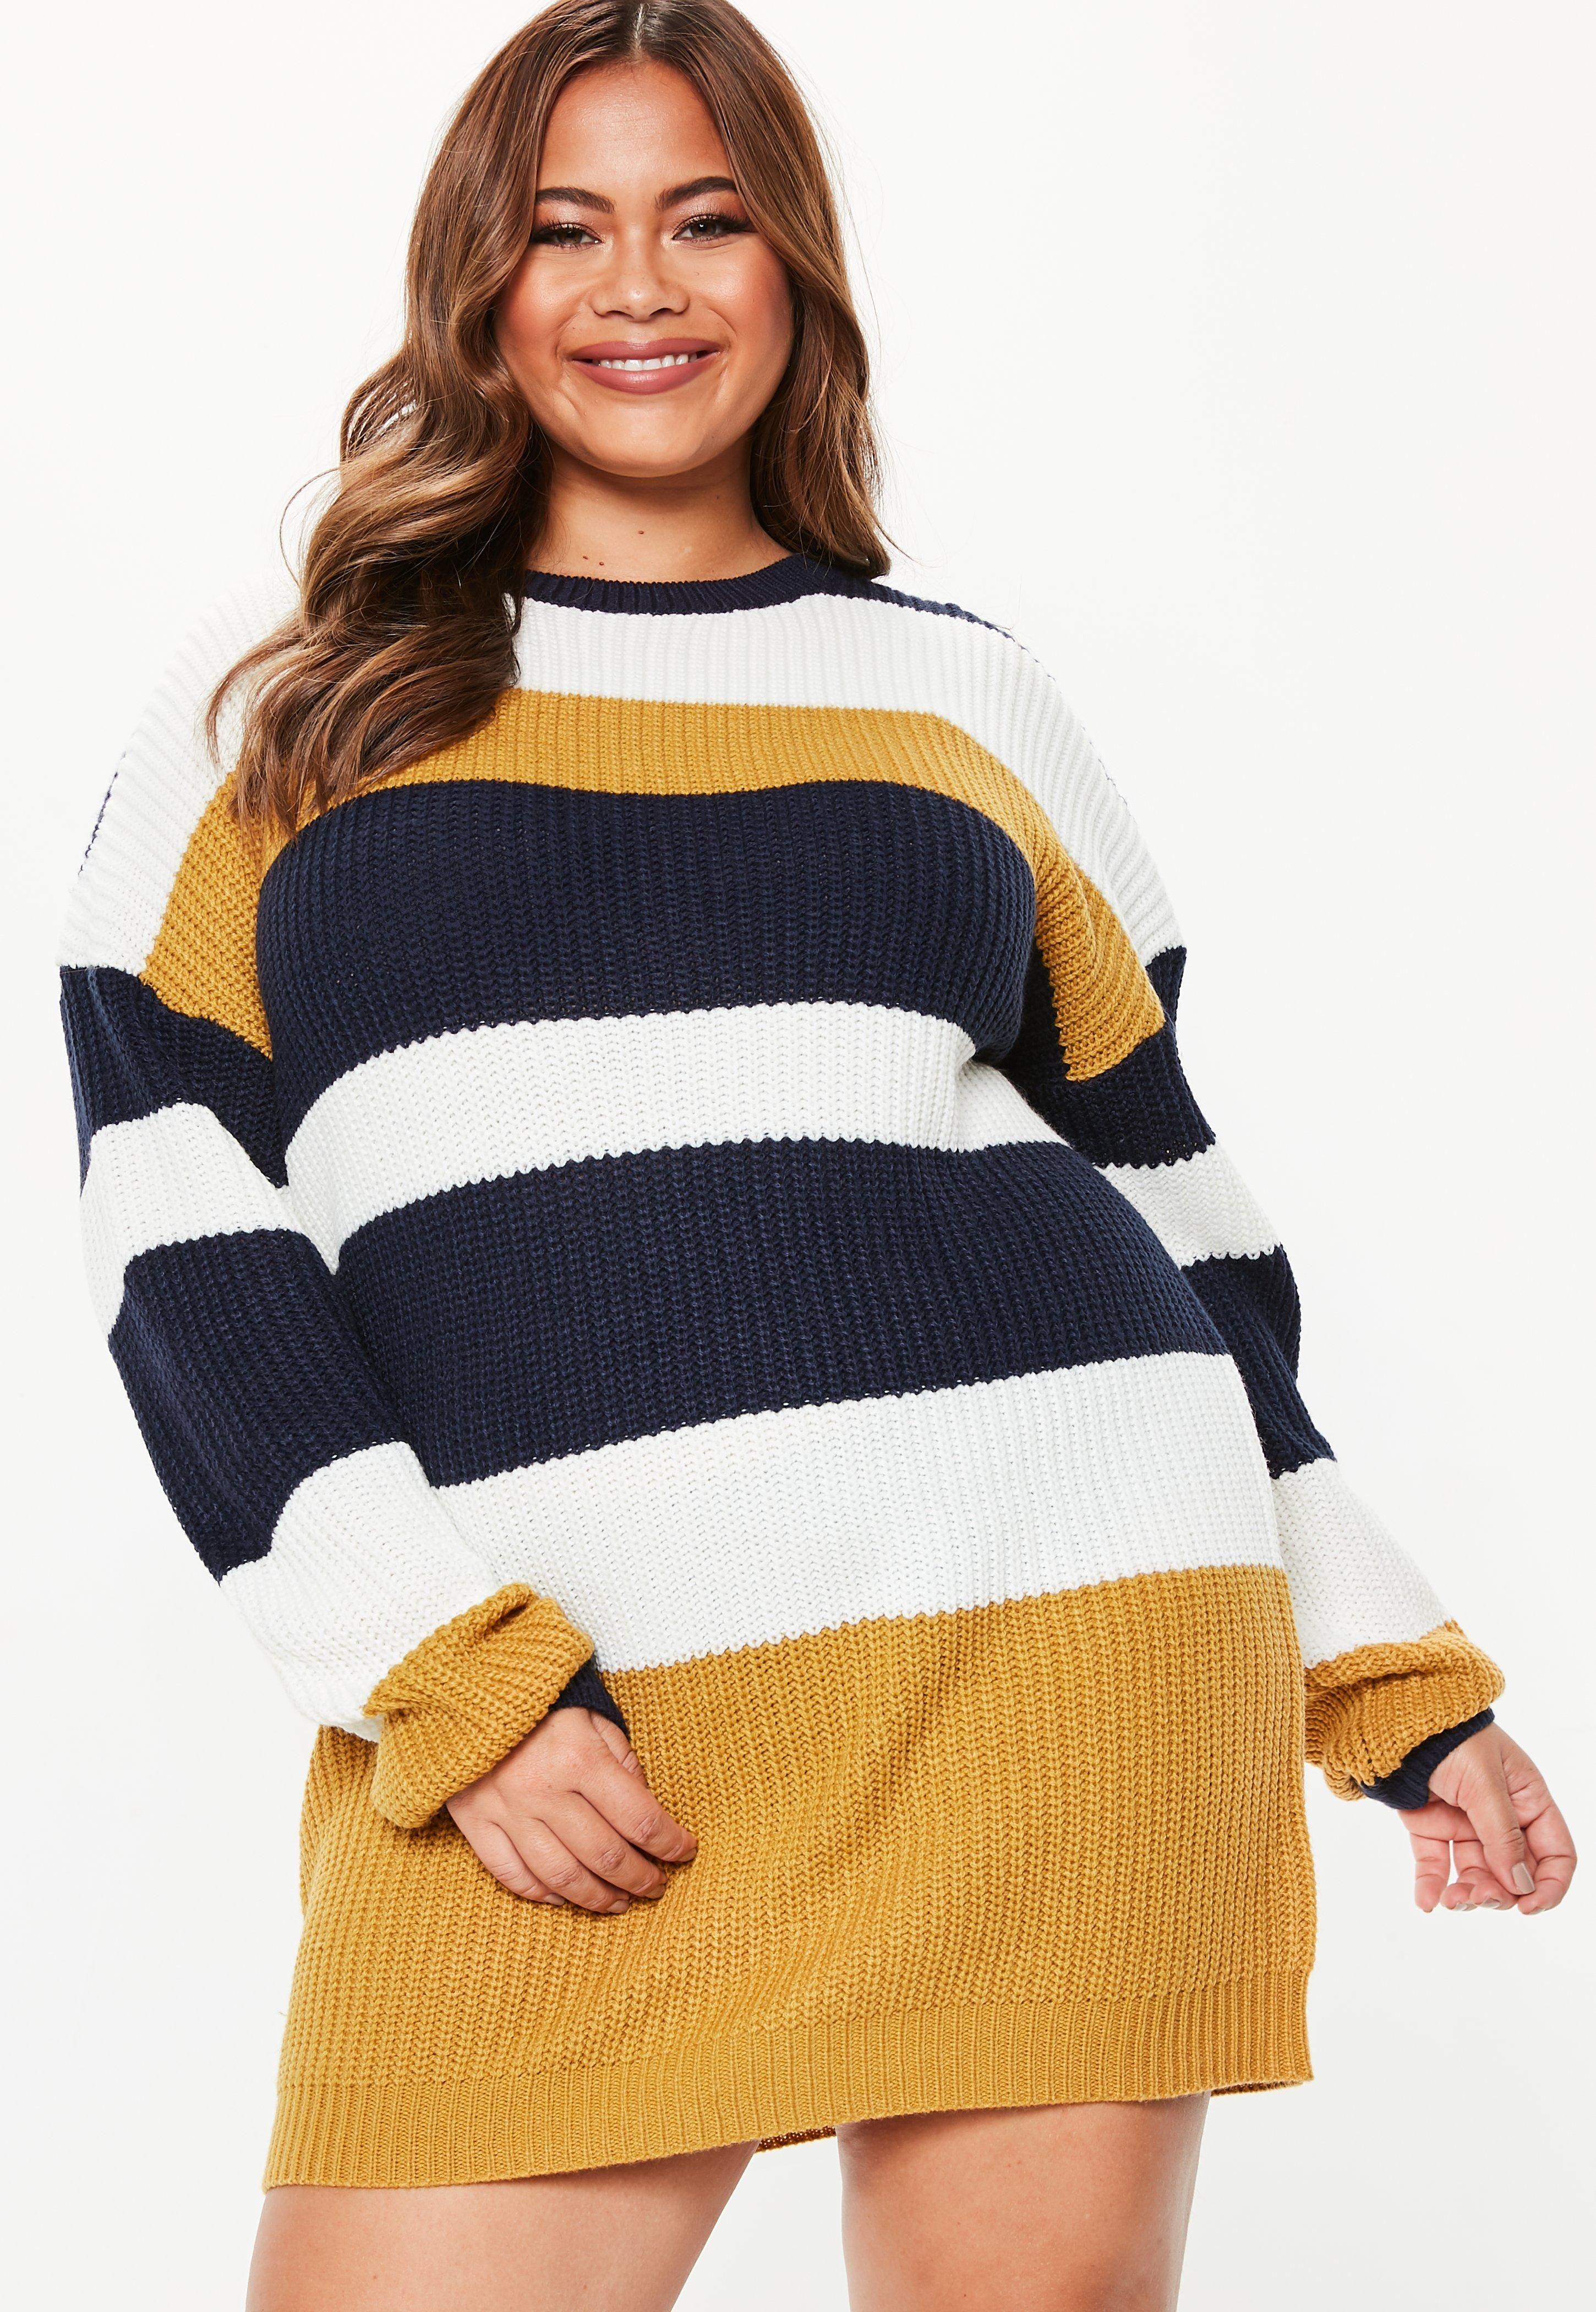 18175b8b365 plus-size-mustard-crew-neck-striped-sweater-dress  sweaters  fashion   sweater  jackets  pants  sweaterweather  hoodies  jeans  dresses  style   winter ...